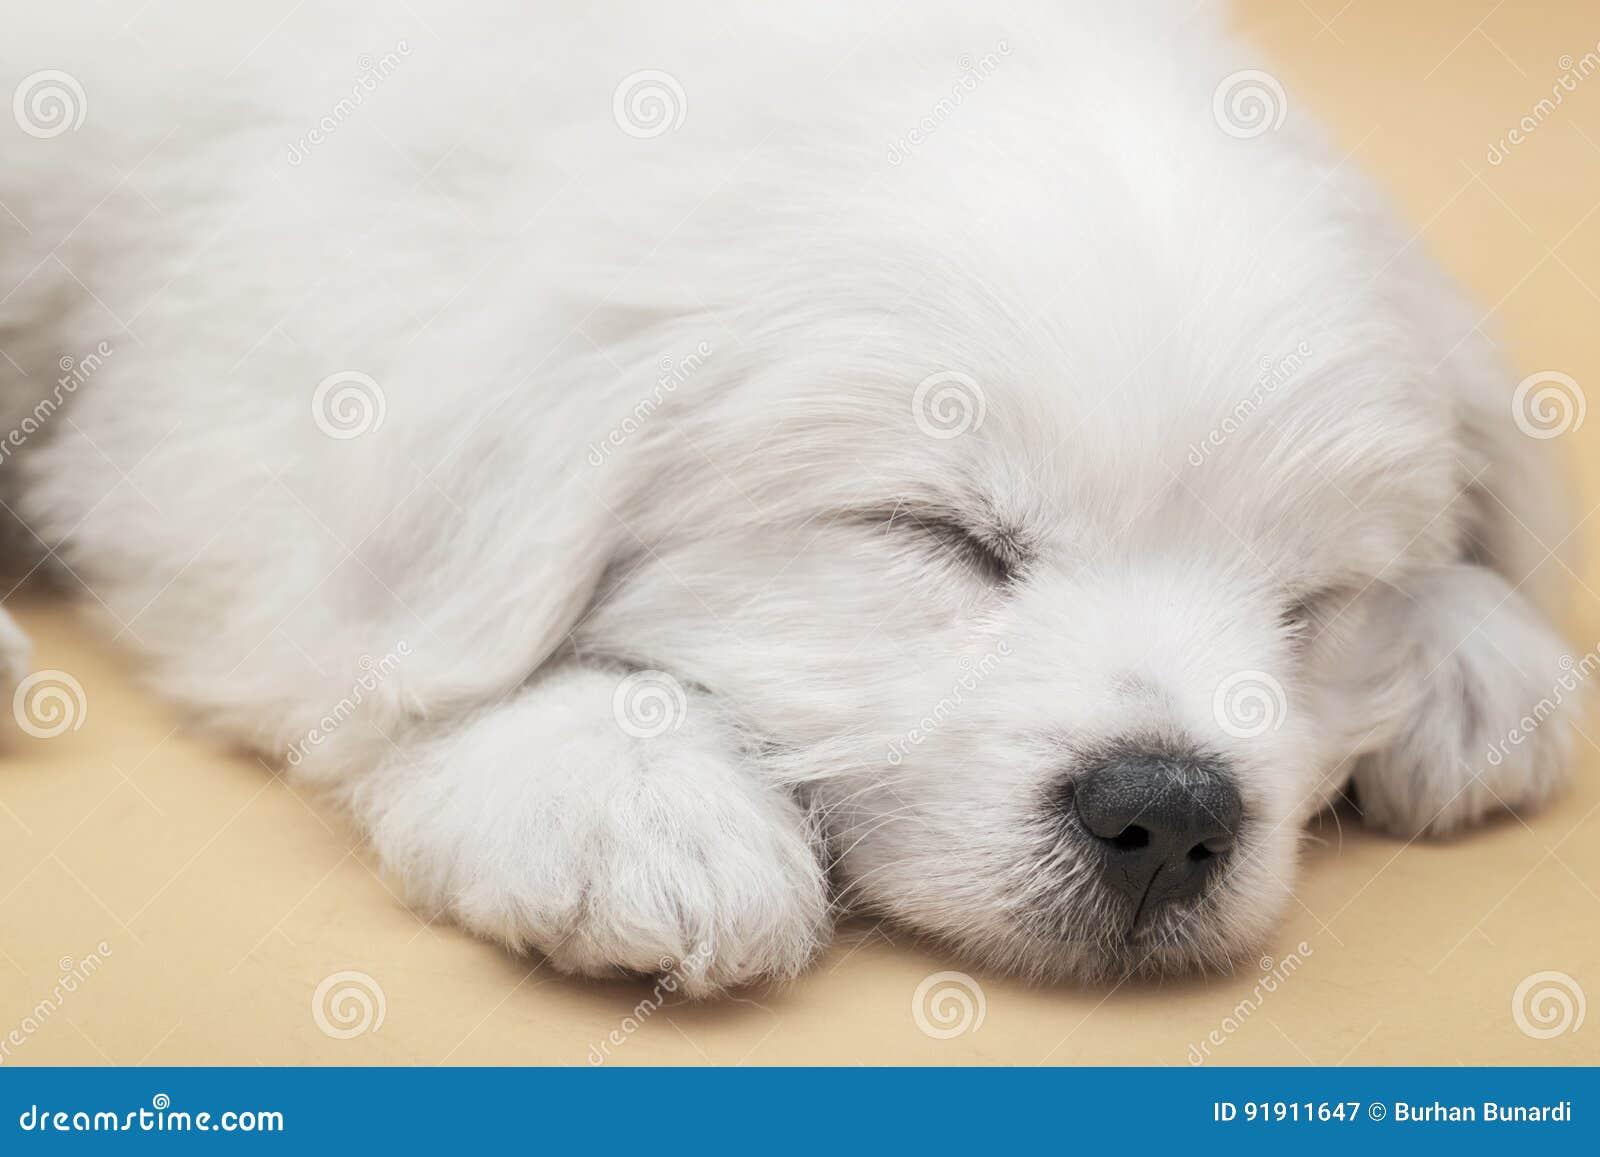 Sleepy Maltese Puppy Stock Image Image Of Studio Small 91911647